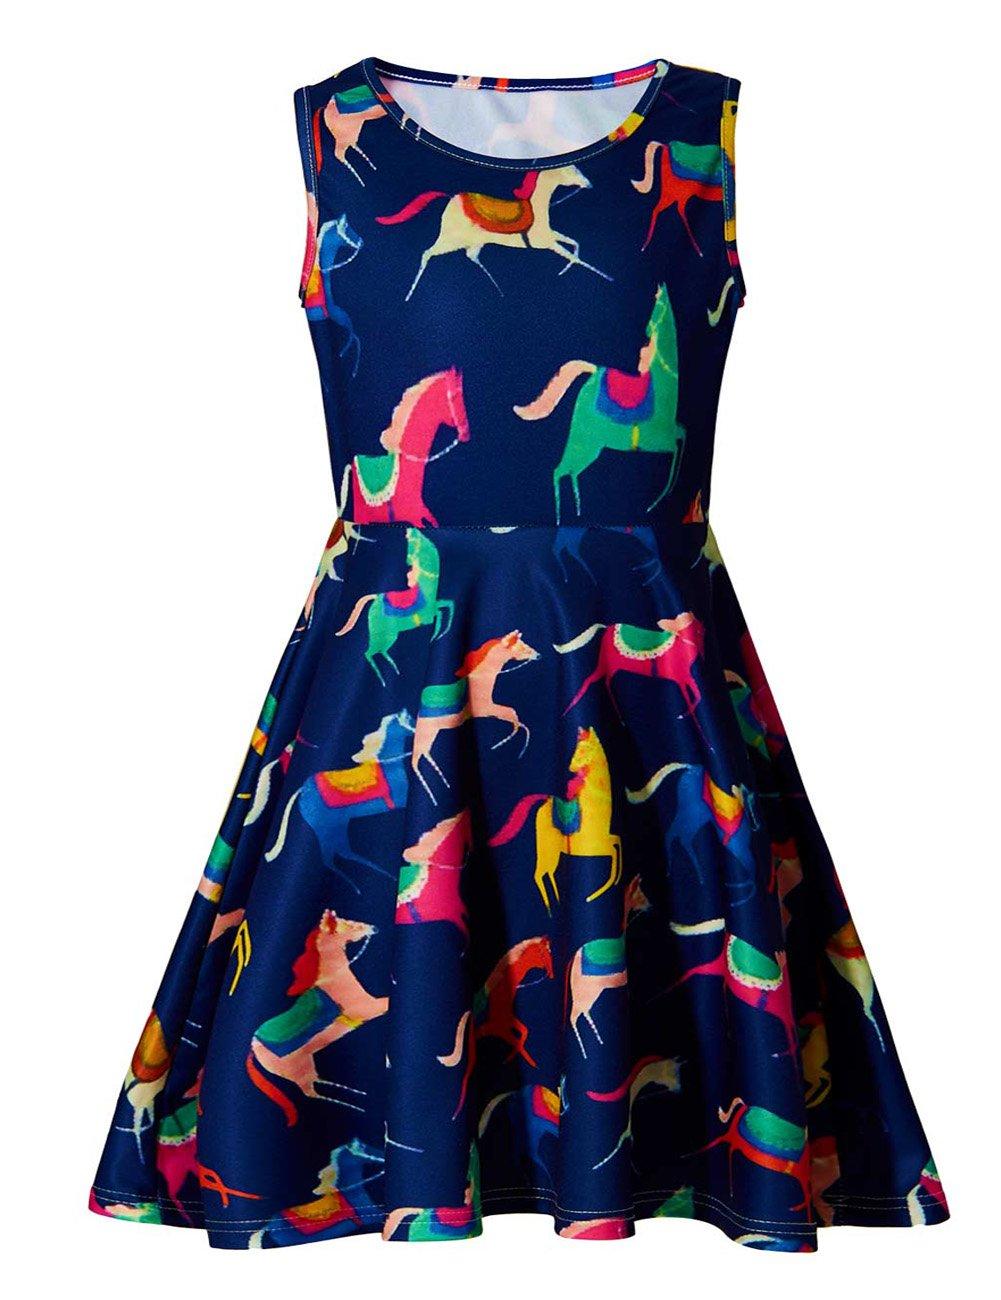 Uideazone Little Girls Print Unicorn Cute Funny A-Line Sleeveless Dress 6-7 Years